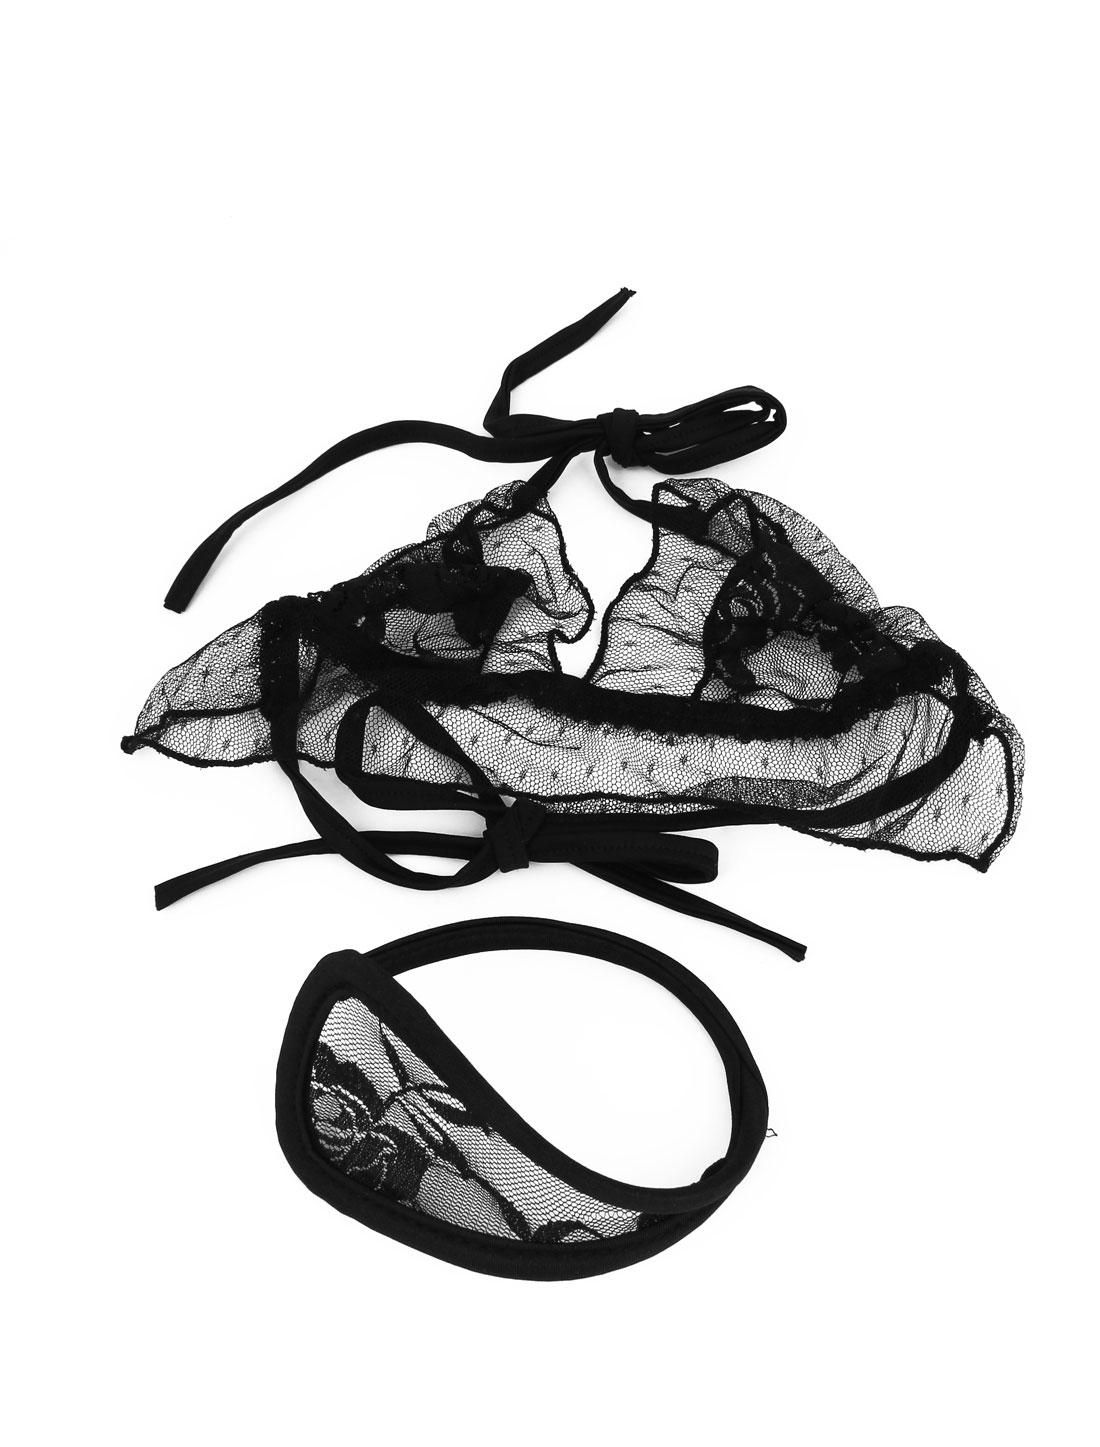 Ladies Meshy Top w C-String Mini Bikini Thong Invisible Underwear Suit Black